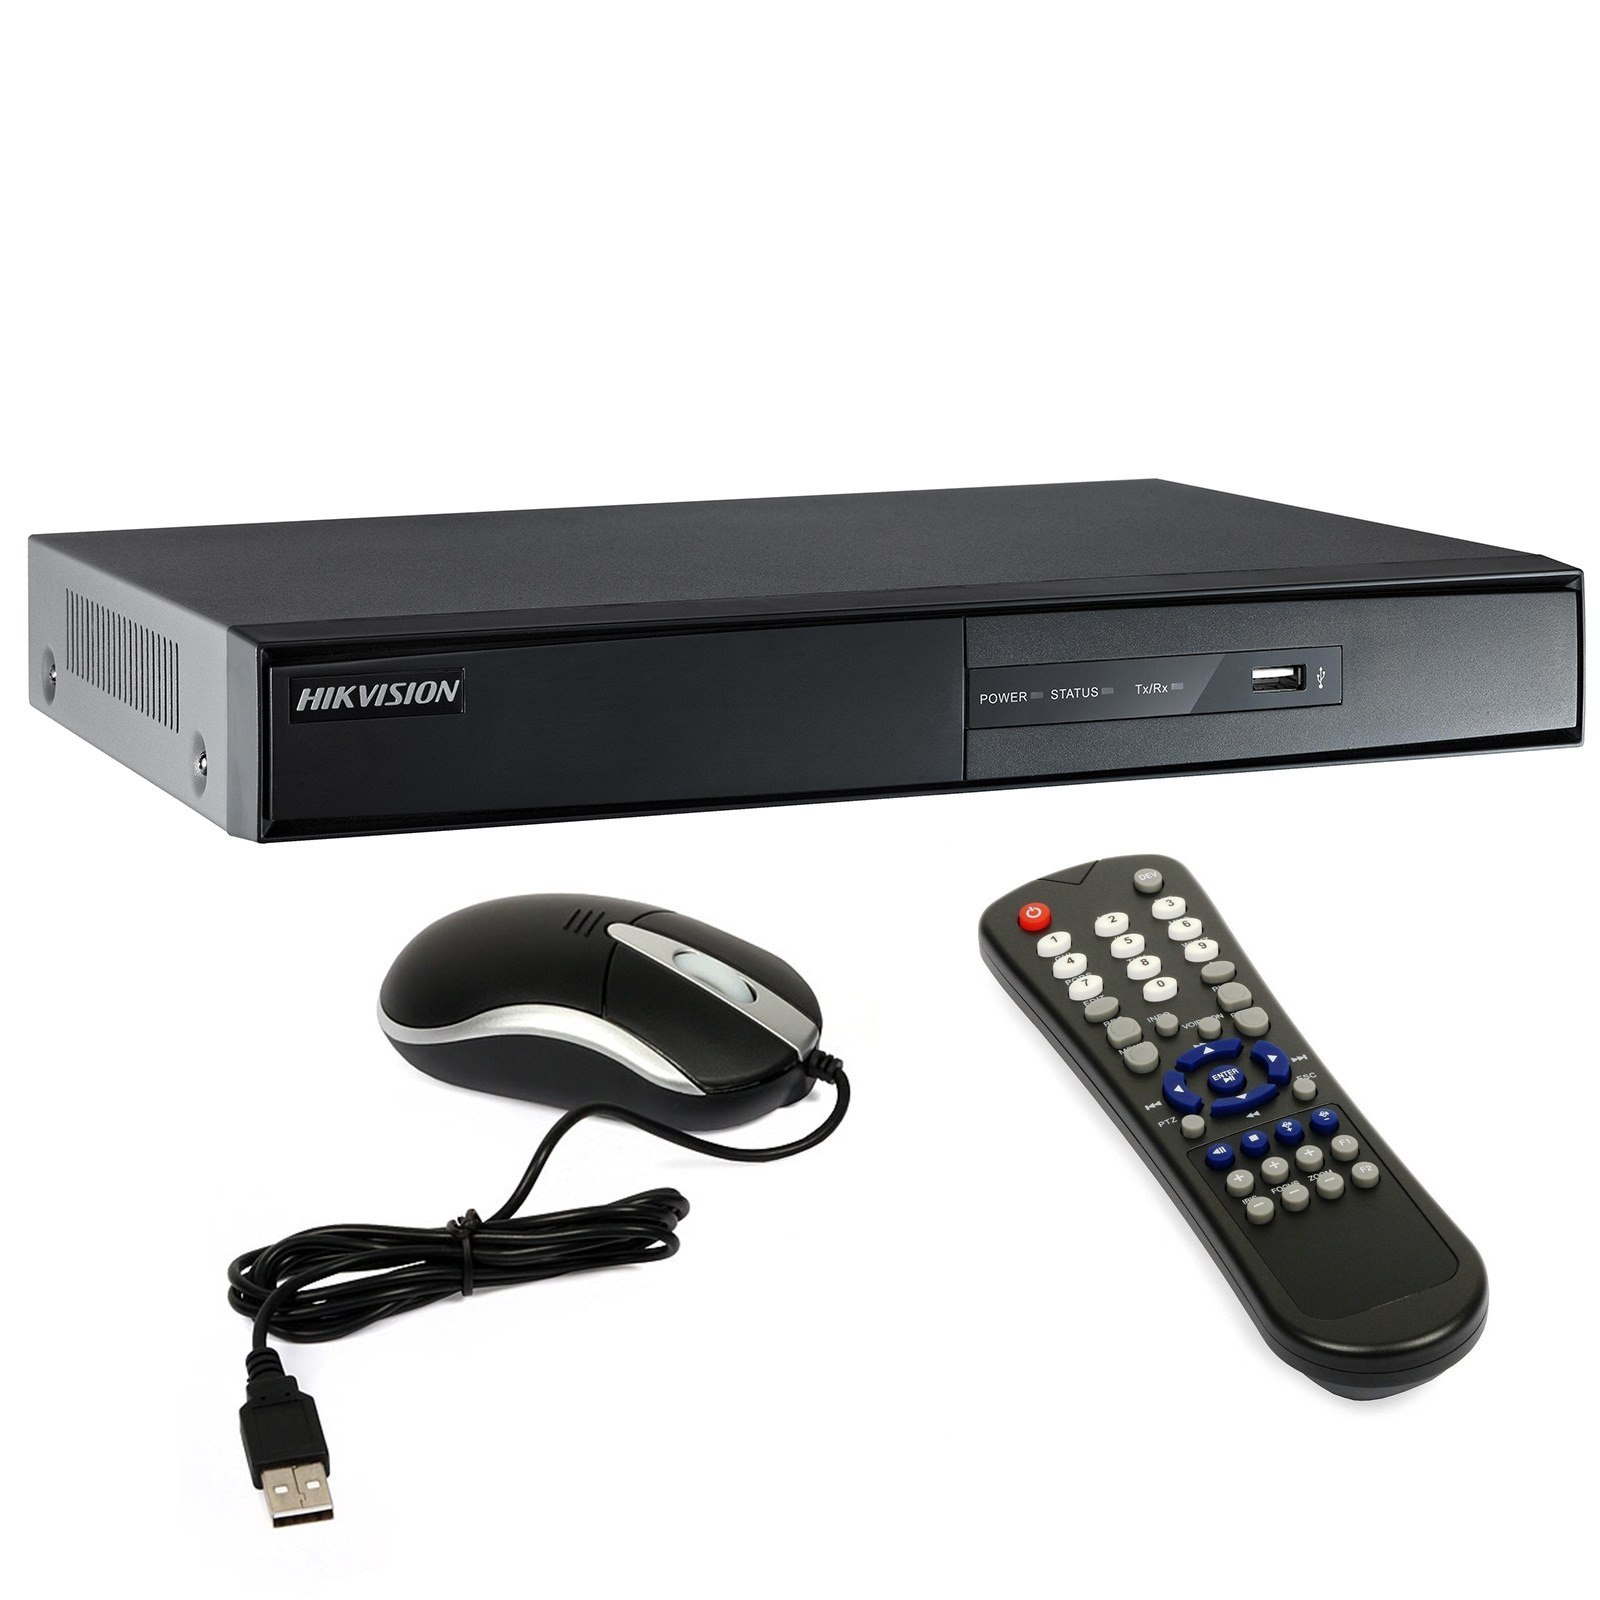 Videoregistratore Dvr 16 Canali HIKVISION Usb Allarme H264 Lan HDMI Cellulare